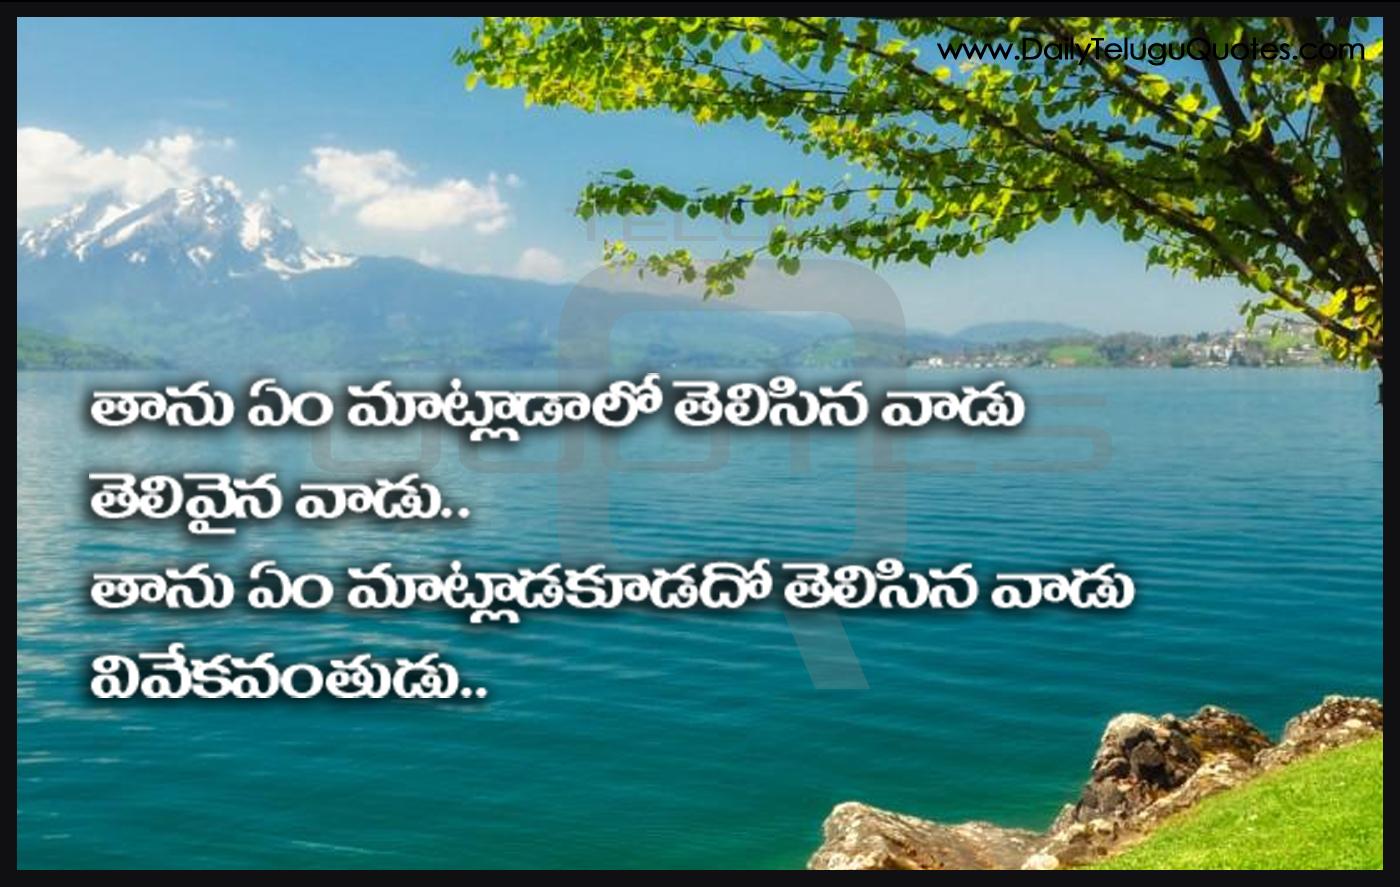 Best Telugu Good Nice Inspirational Quotes Hd Wallpapers Beautiful